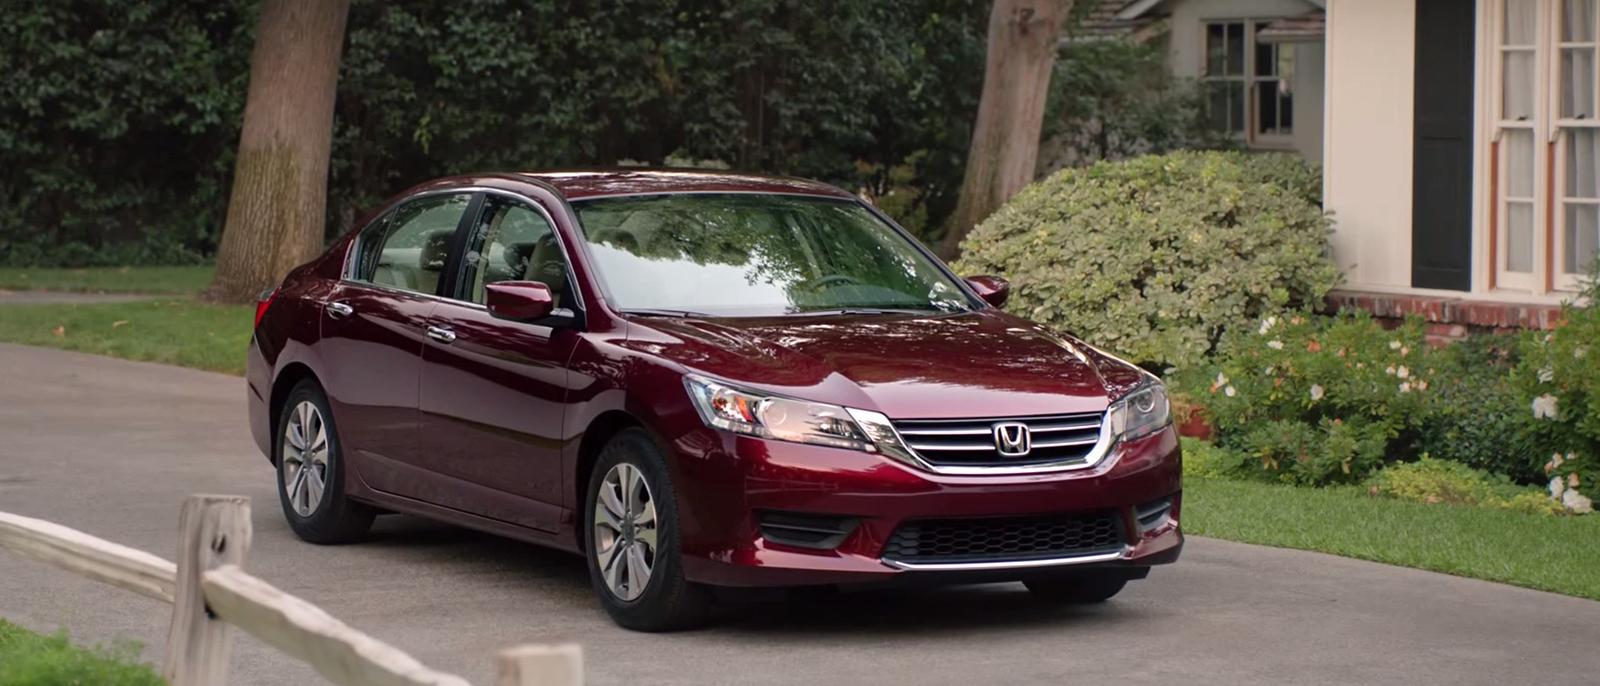 2015 Honda Accord Exterior